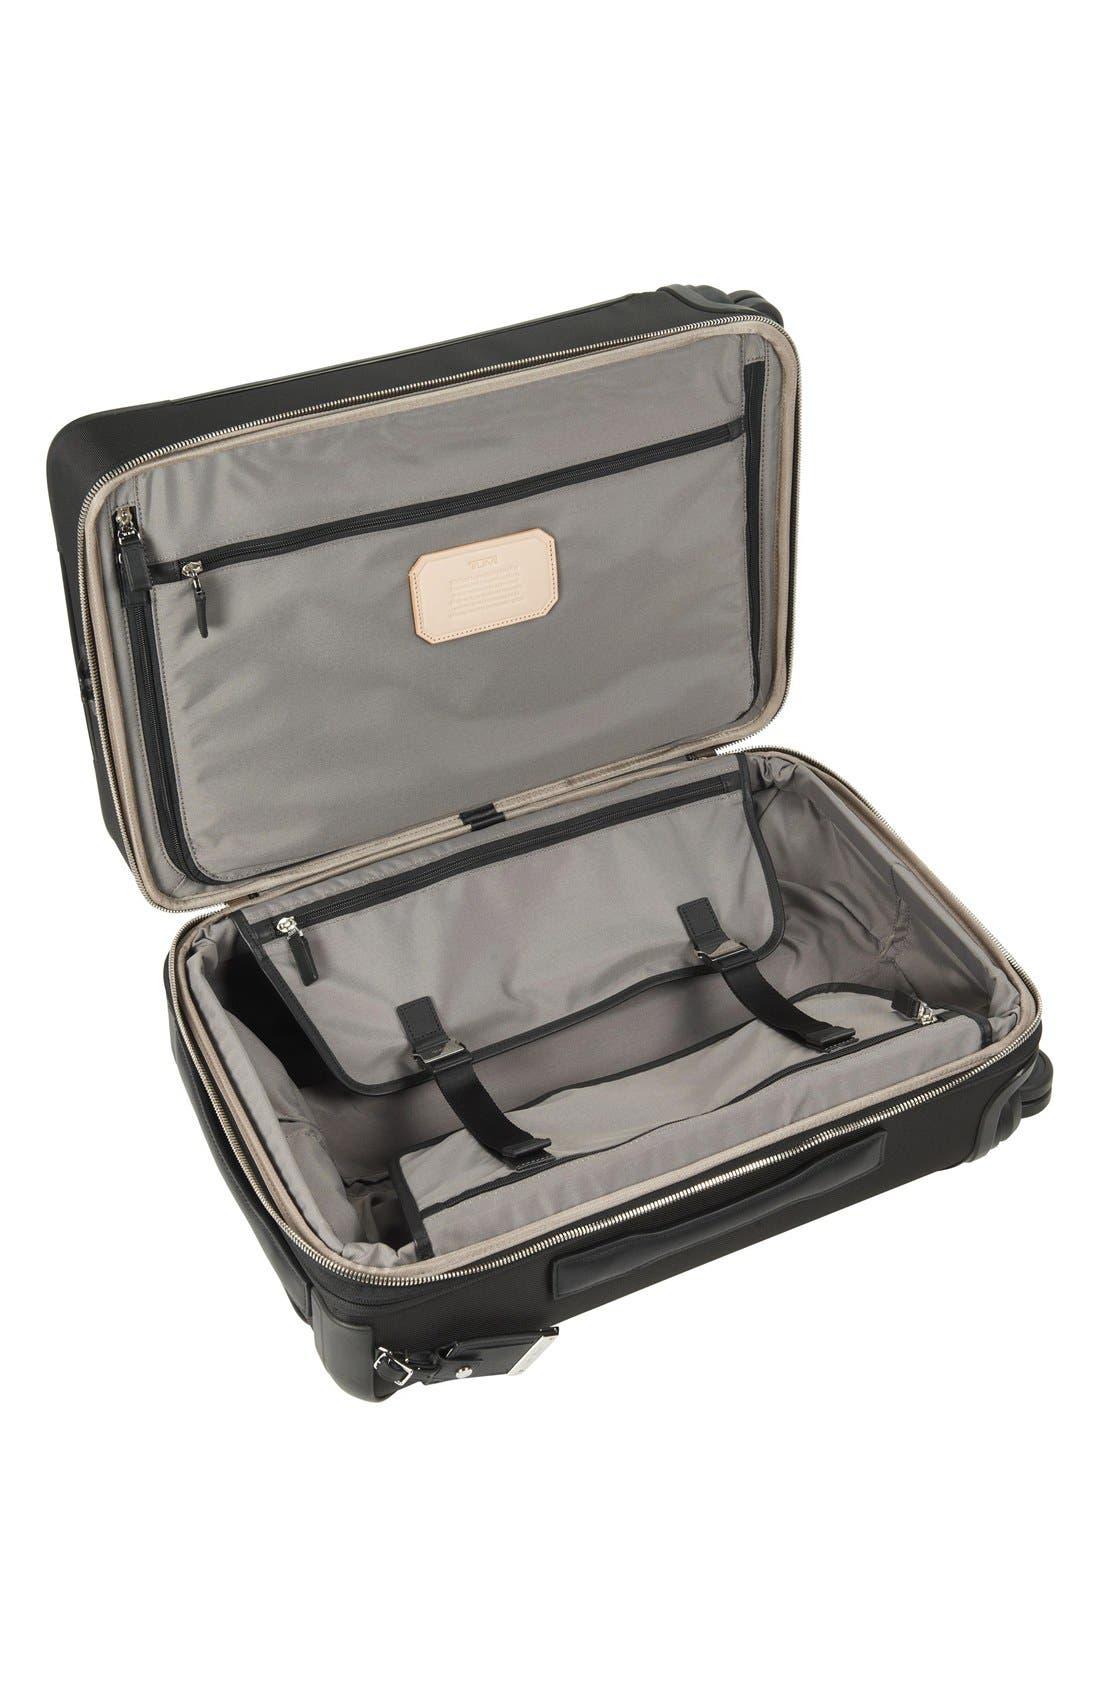 'Astor - Osborne' 4-Wheeled Carry-On Suitcase,                             Alternate thumbnail 6, color,                             001